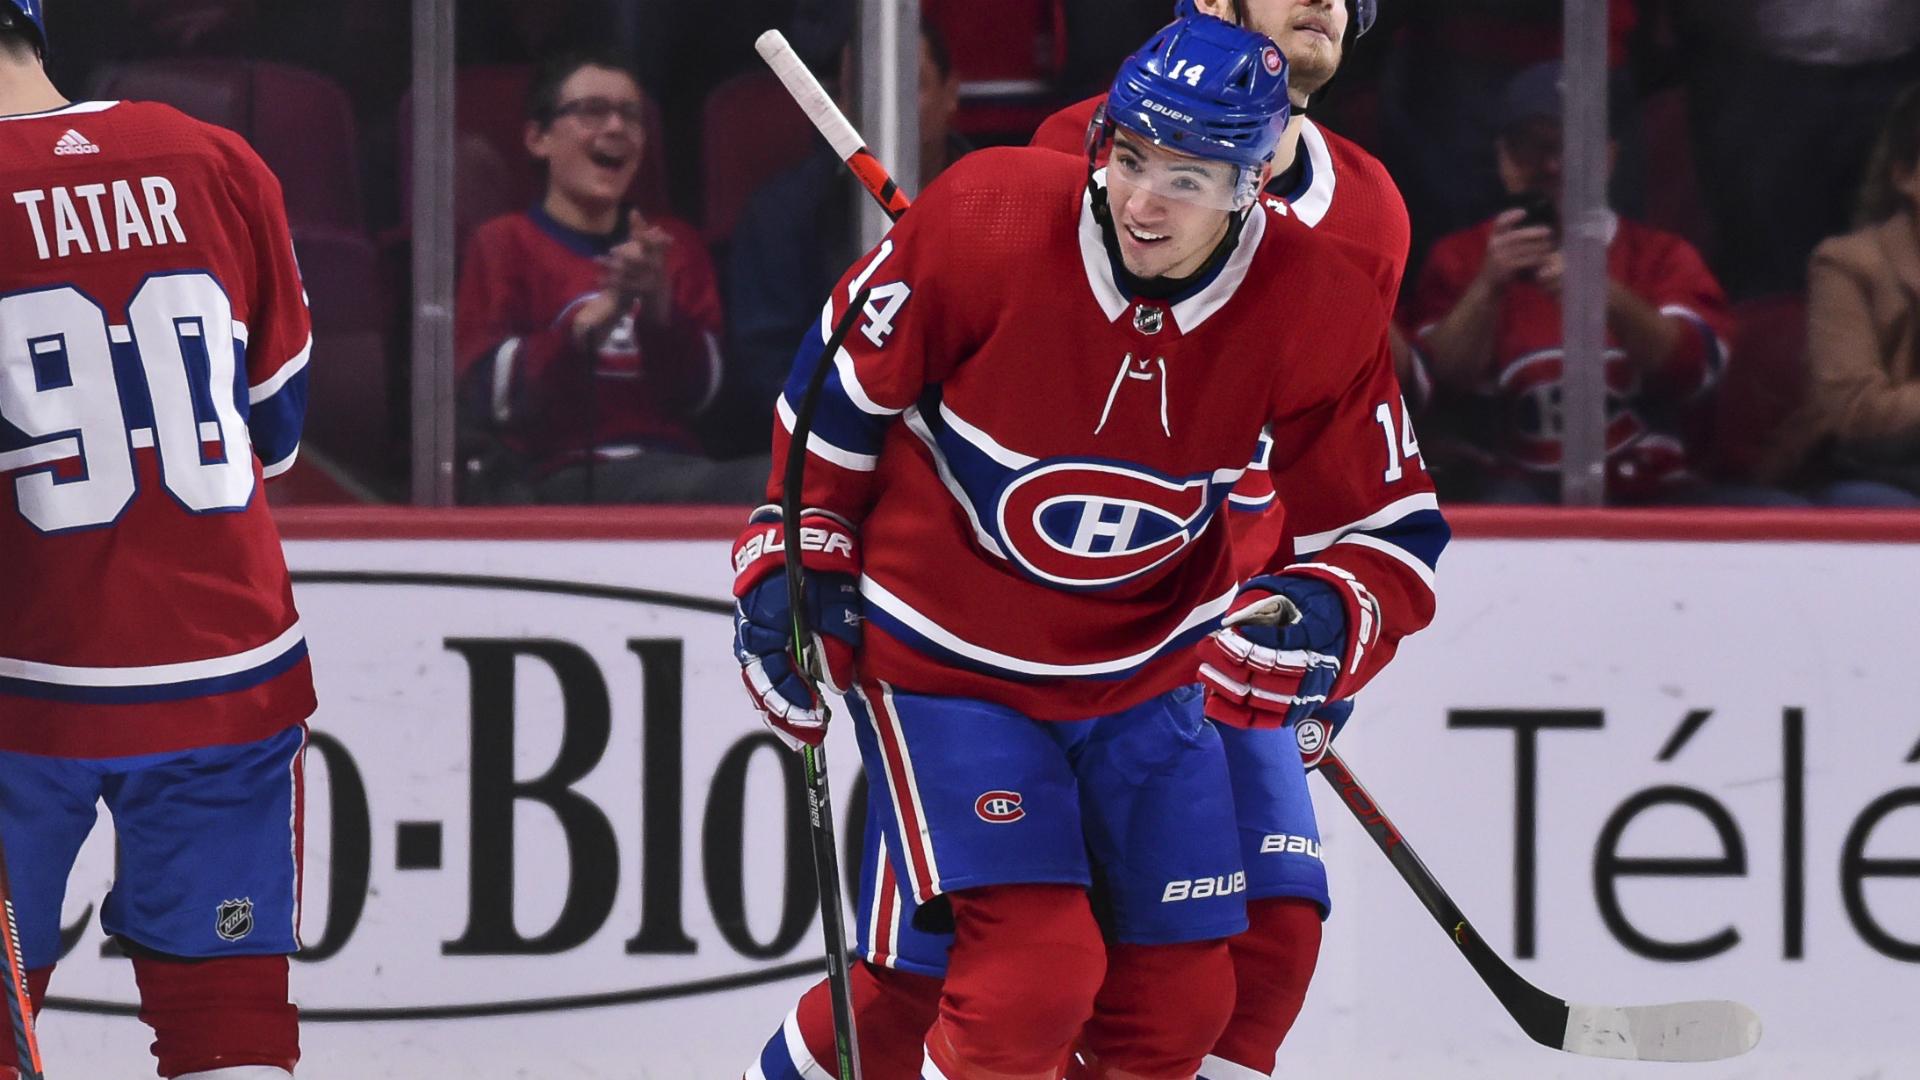 Montreal Canadiens rookie Nick Suzuki scores first career goal